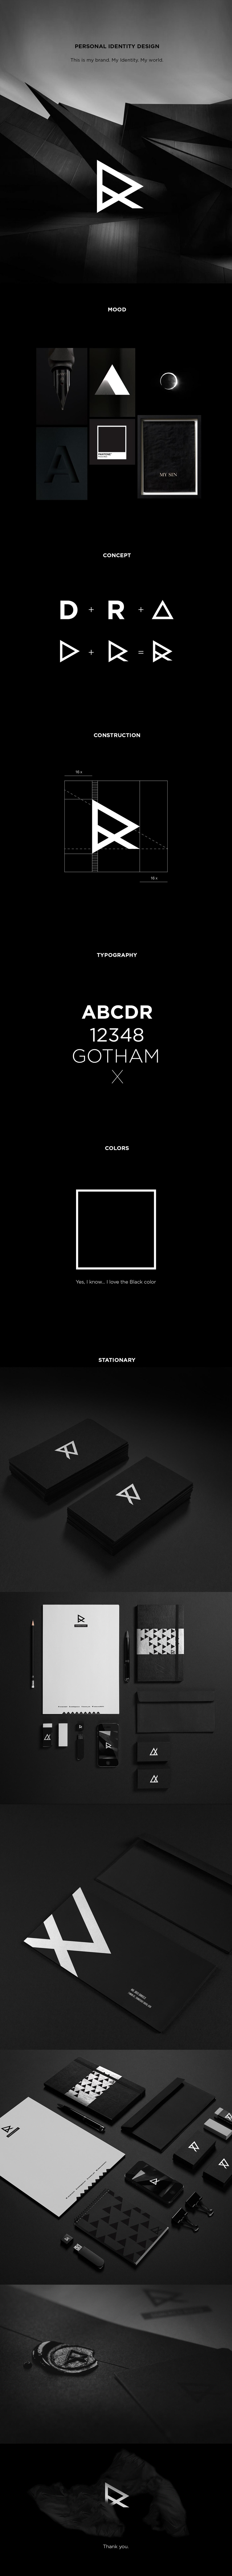 brand identity Behance corporate ID typo graphic design black domenico ruffo logo apple mac iphone